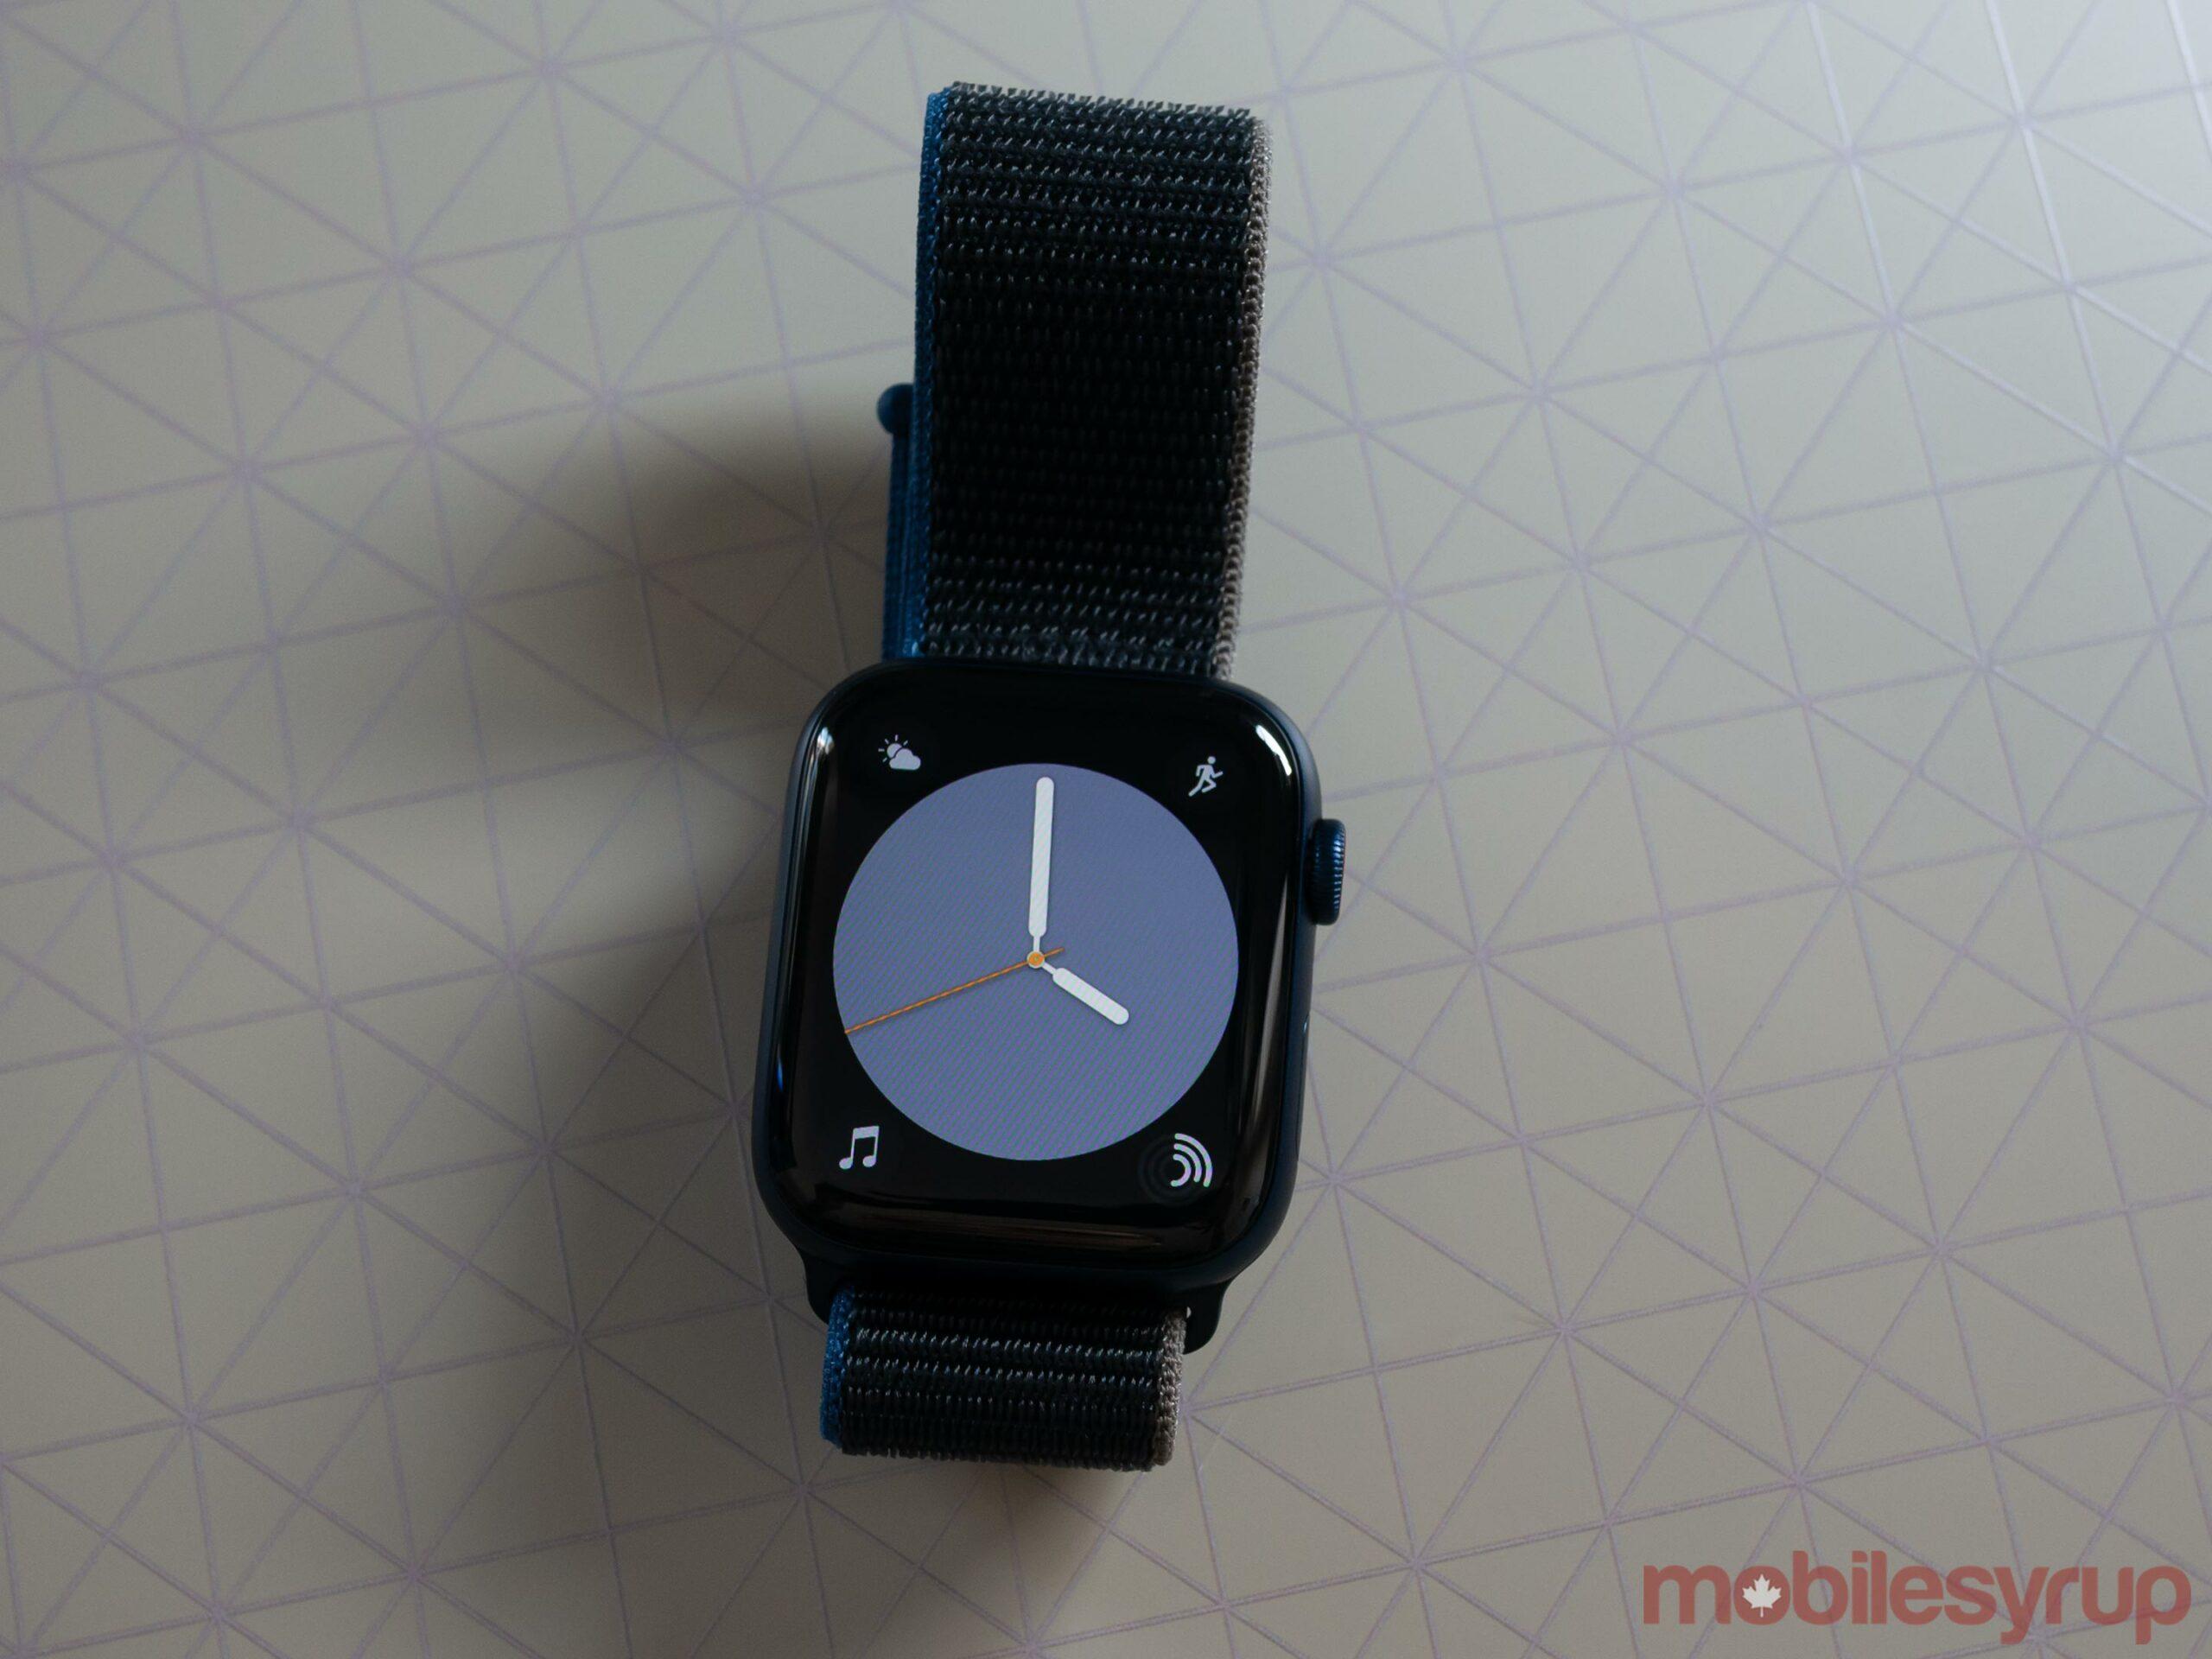 Apple Watch Series 6 Colour Watch Face